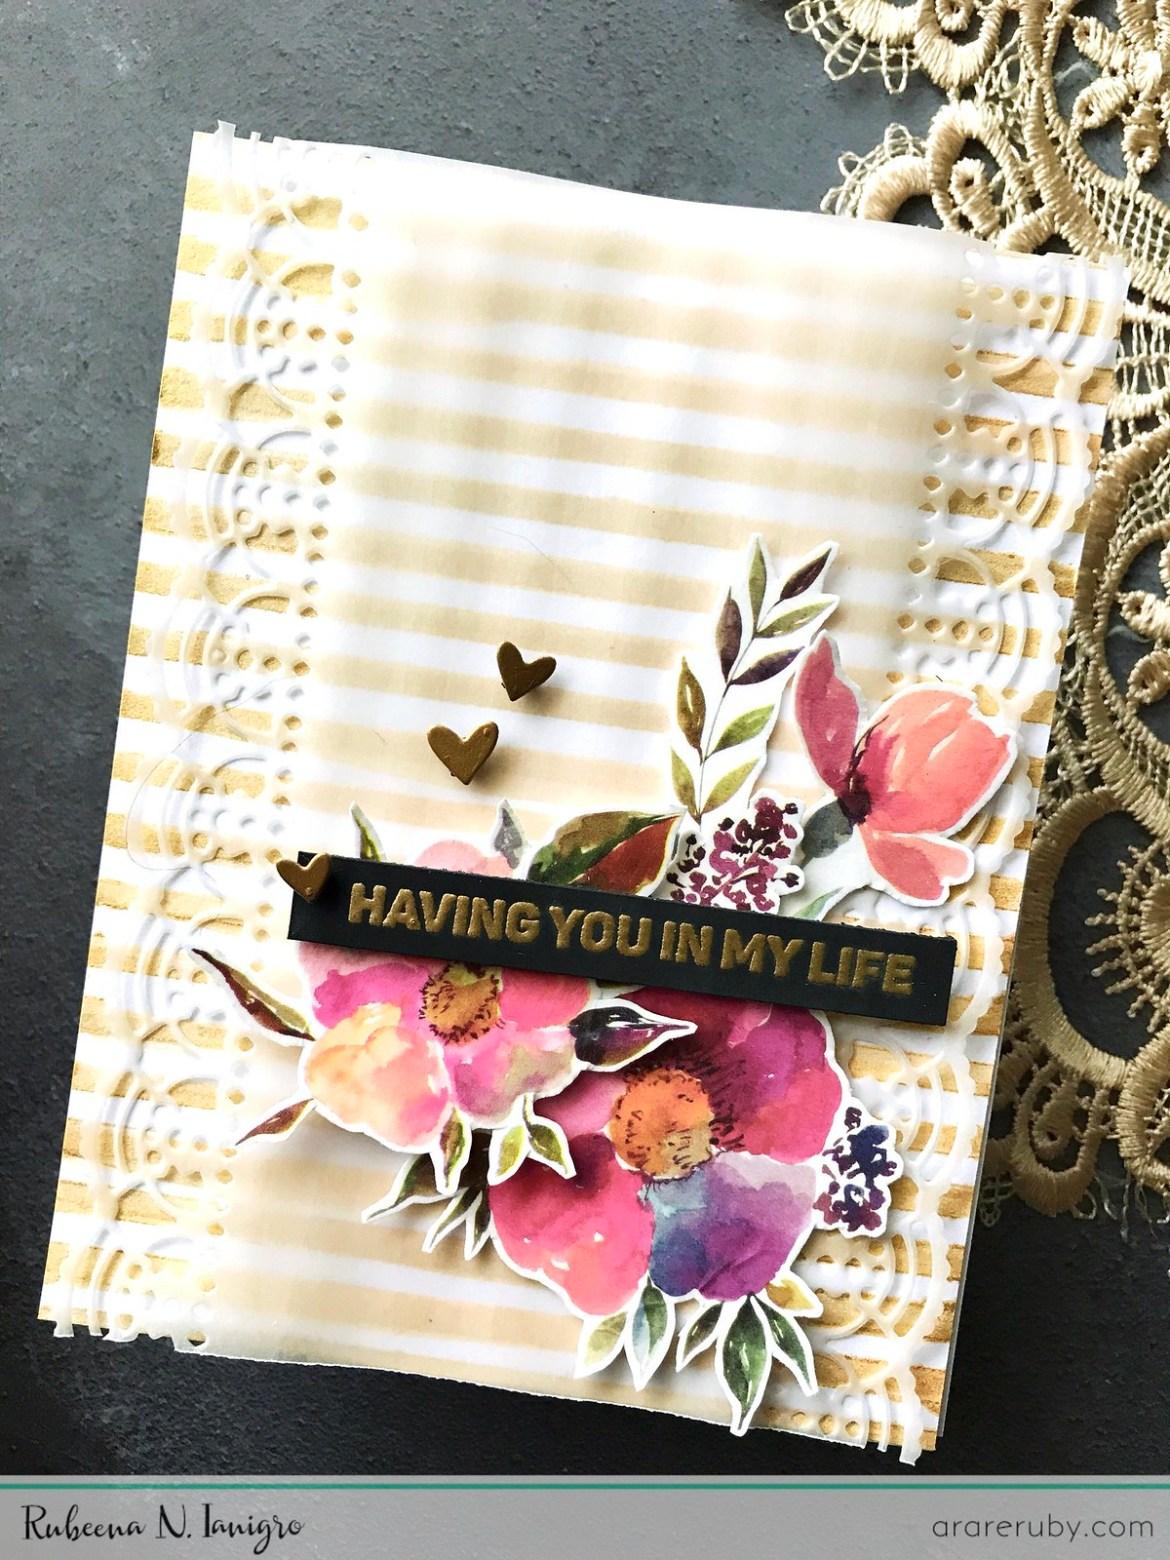 Altenew - Antique Gold Metallic Ink Spray - Classy Stripes Stencil - Floral Flurries Washi Tape - Rubeena Ianigro